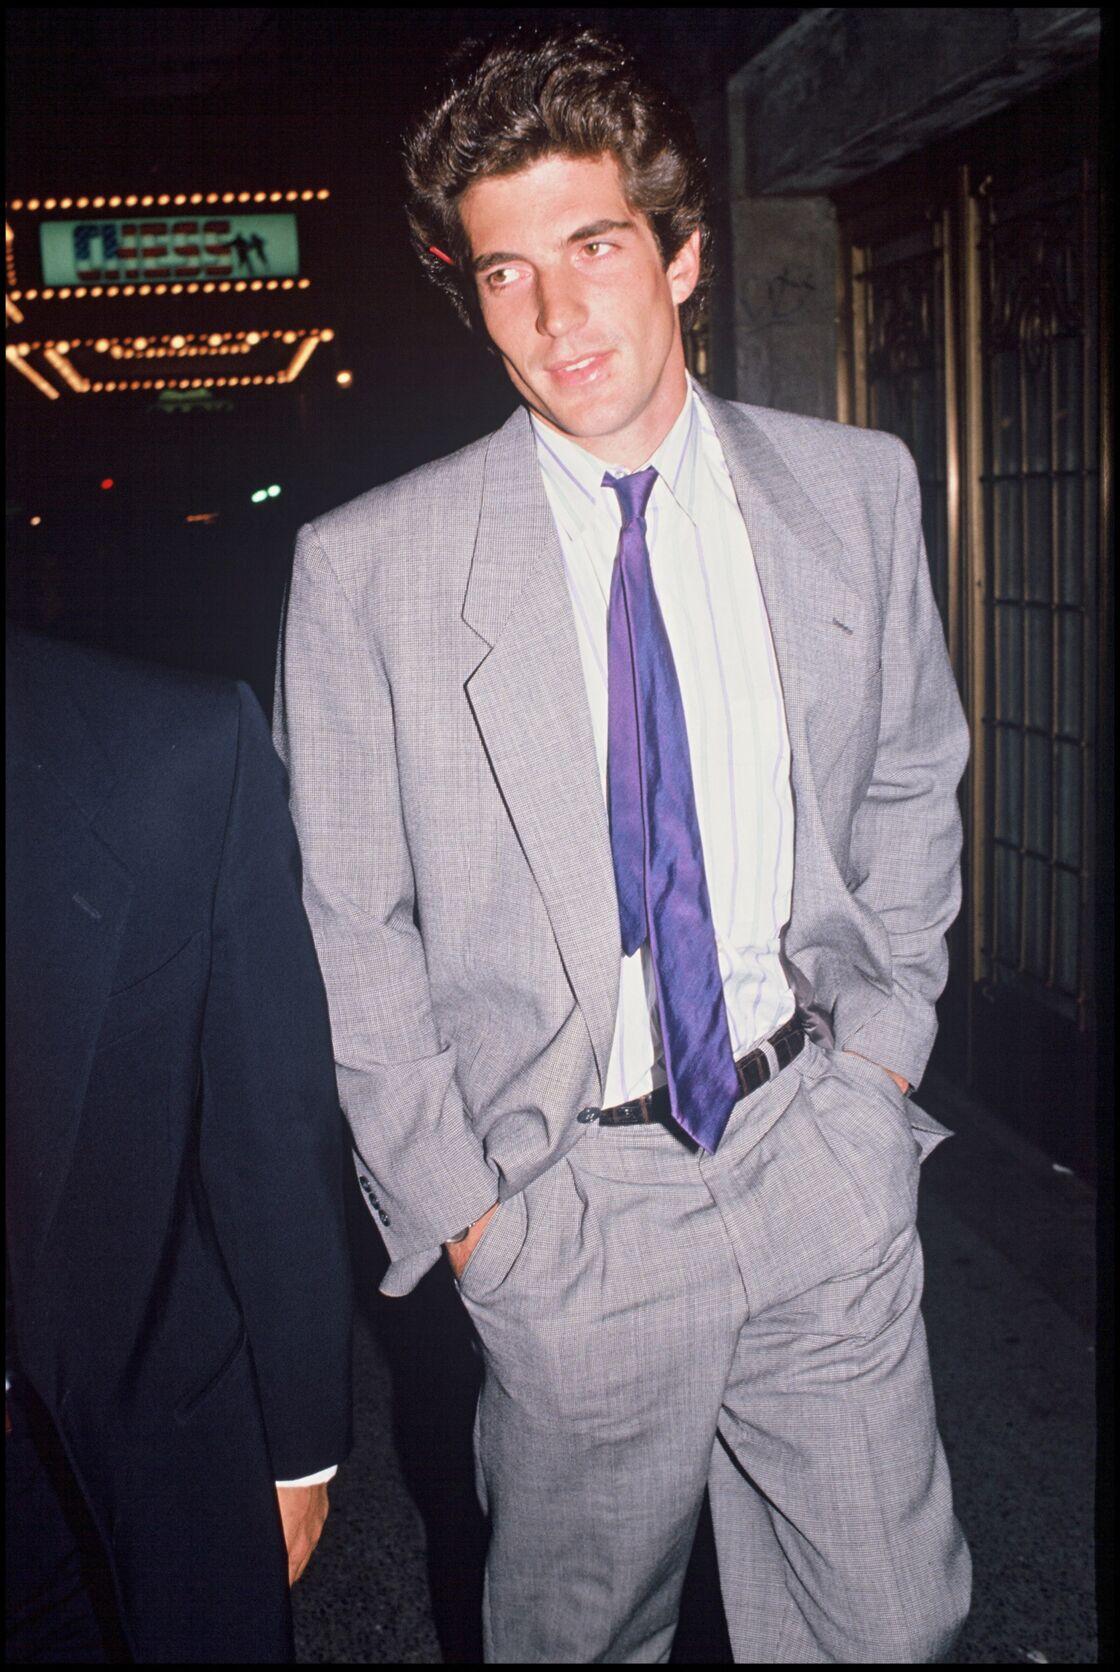 John John Kennedy réussira à passer 1h30 avec Lady Diana